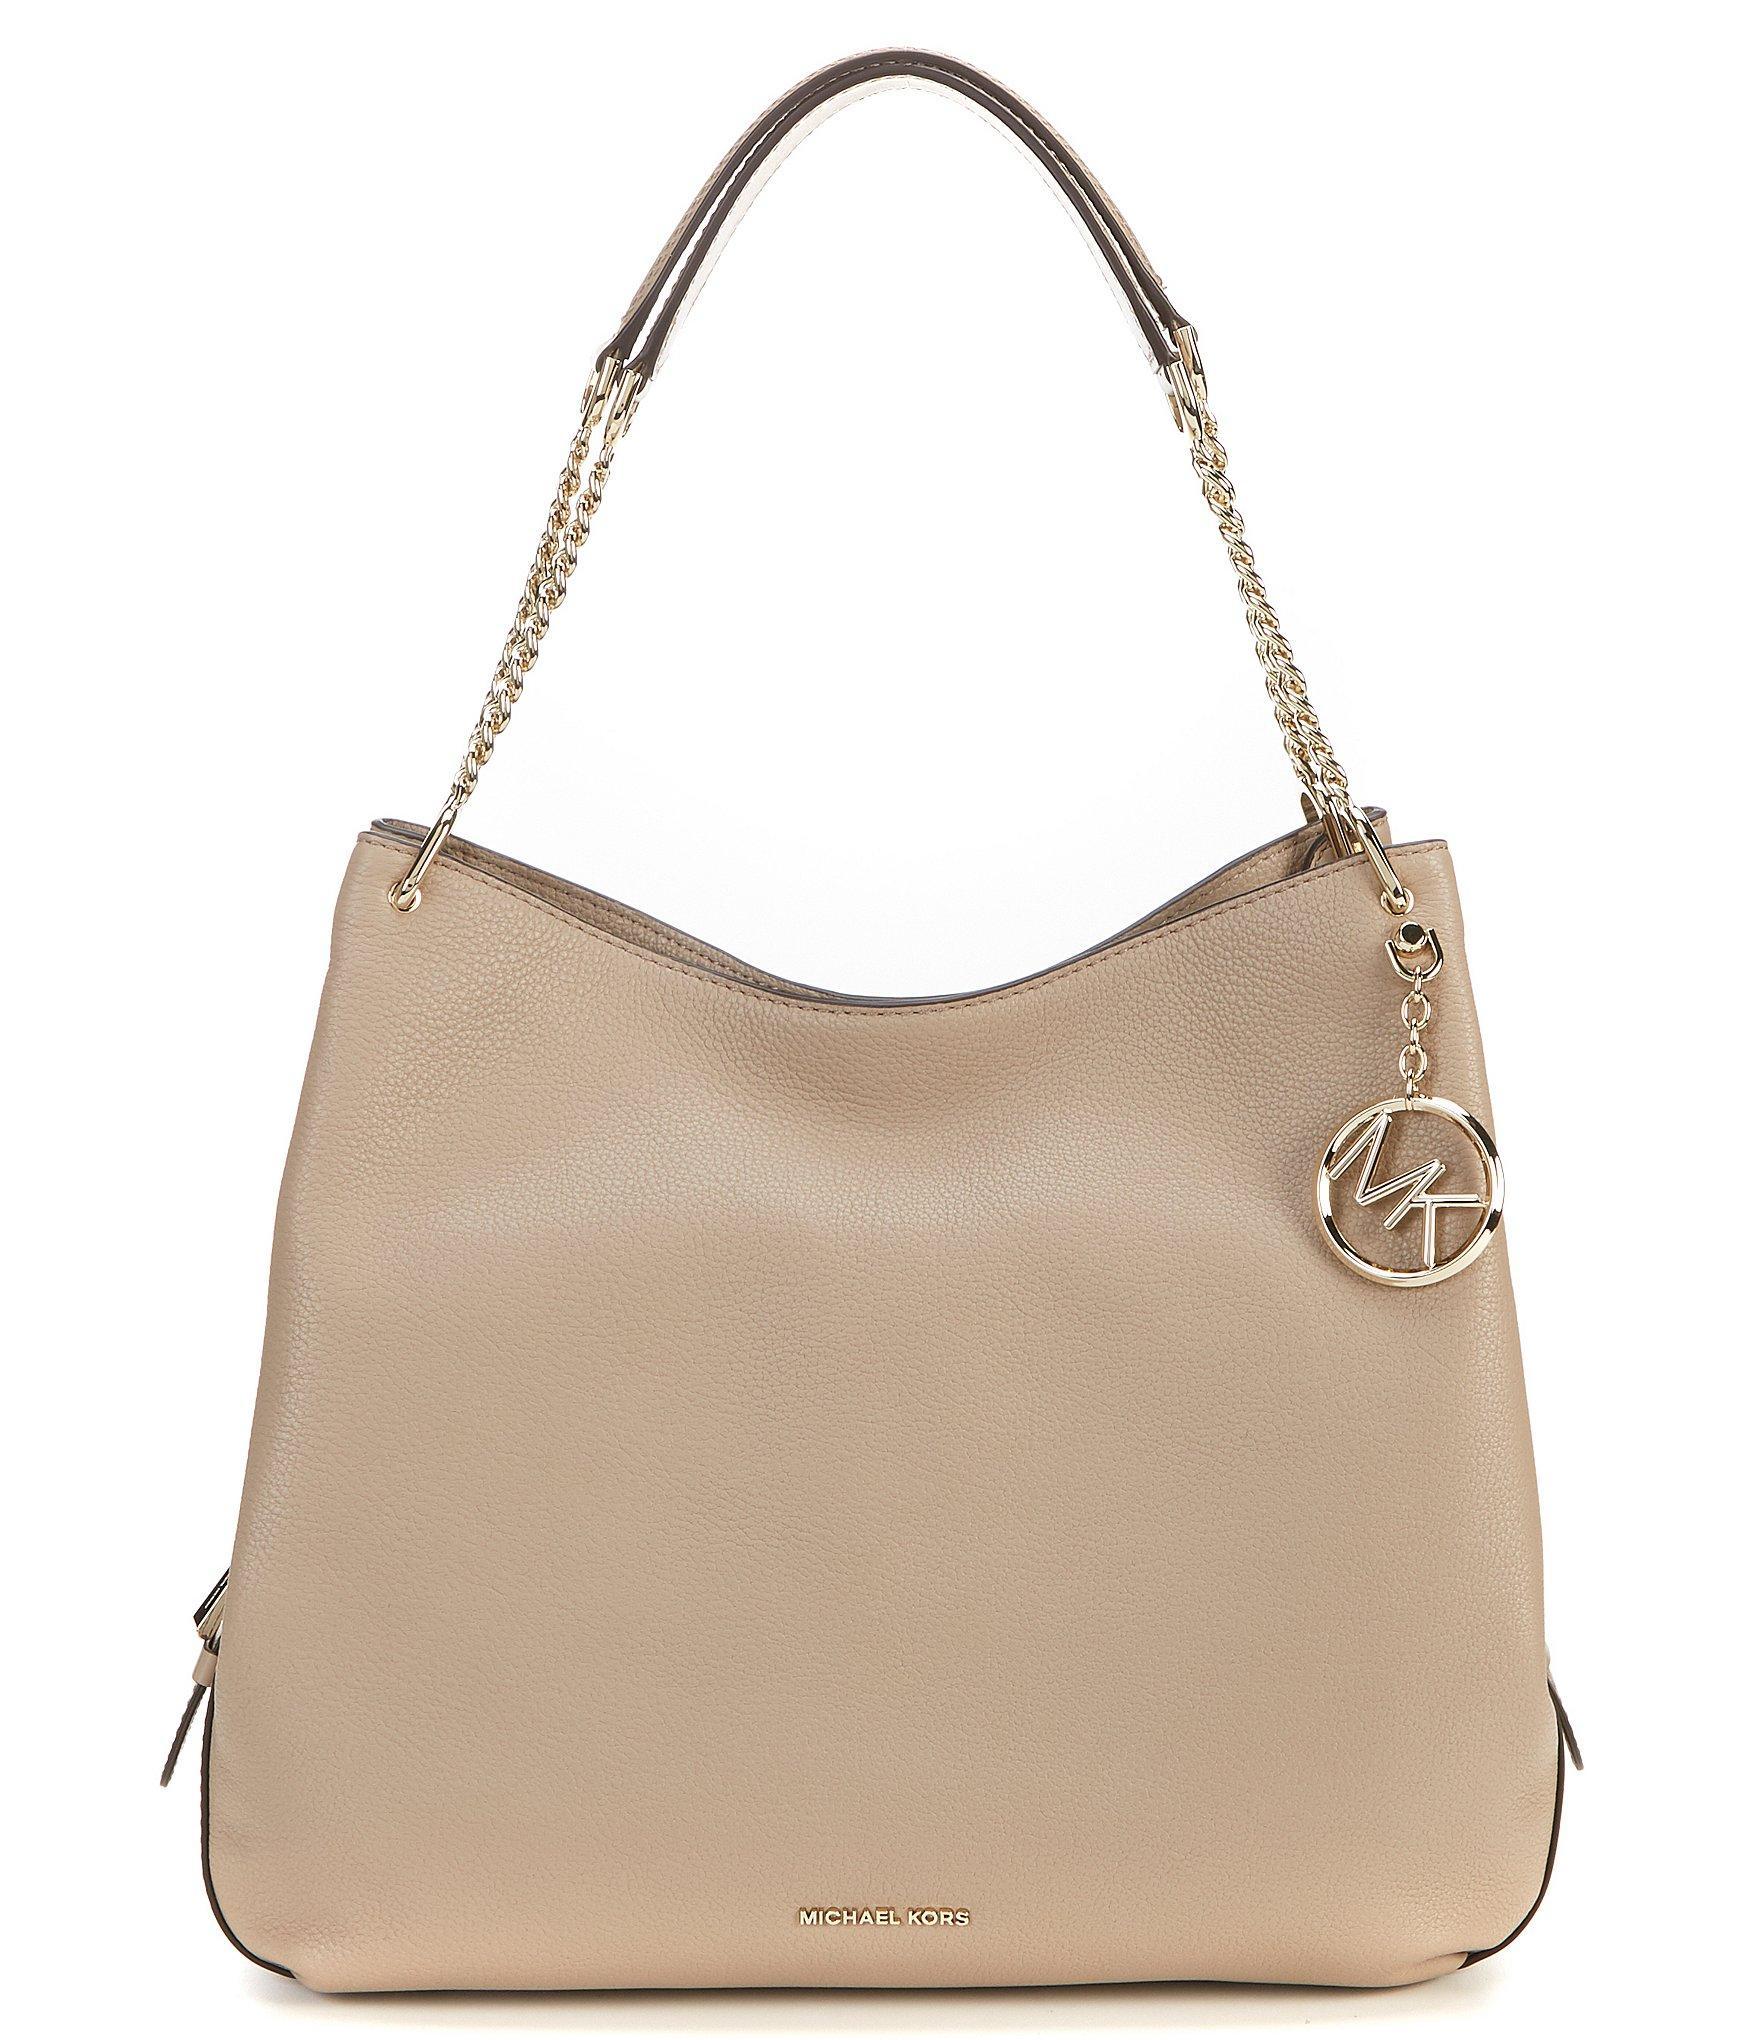 8e0bba7d44fe MICHAEL Michael Kors. Women s Lillie Large Shoulder Tote Bag